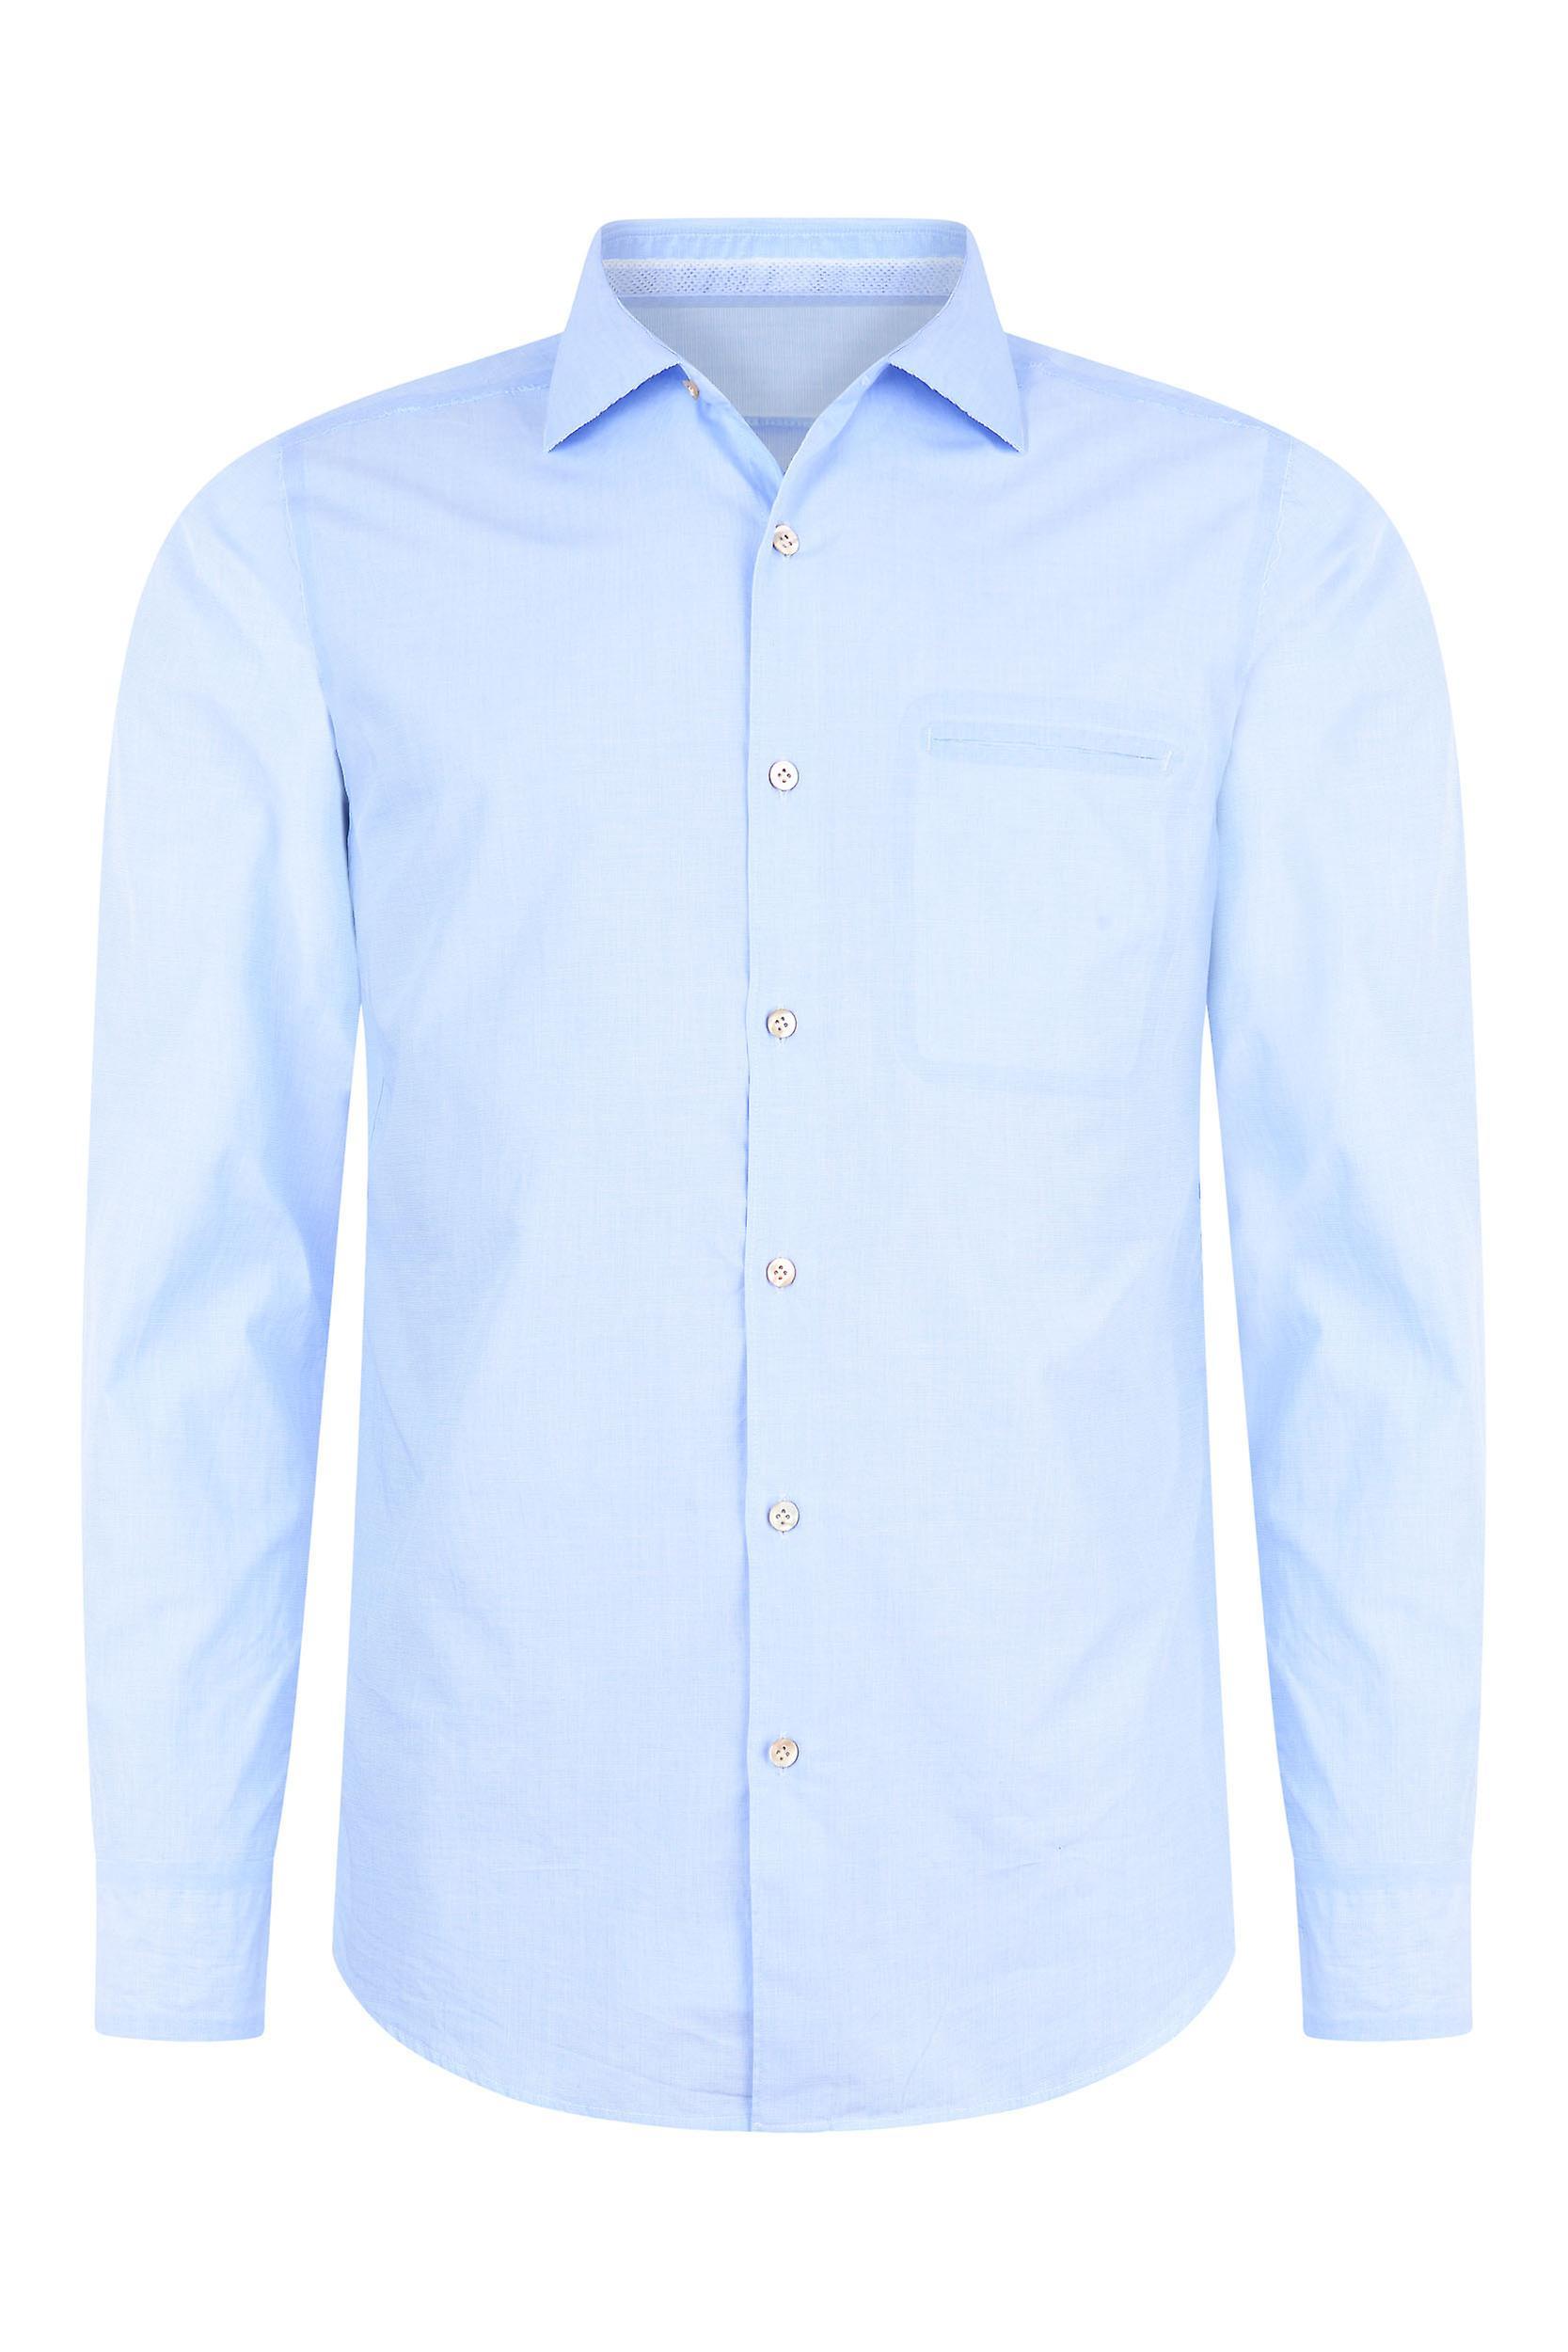 Fabio Giovanni San Sabino Shirt - Mens Luxury Italian Blue Cotton Shirt